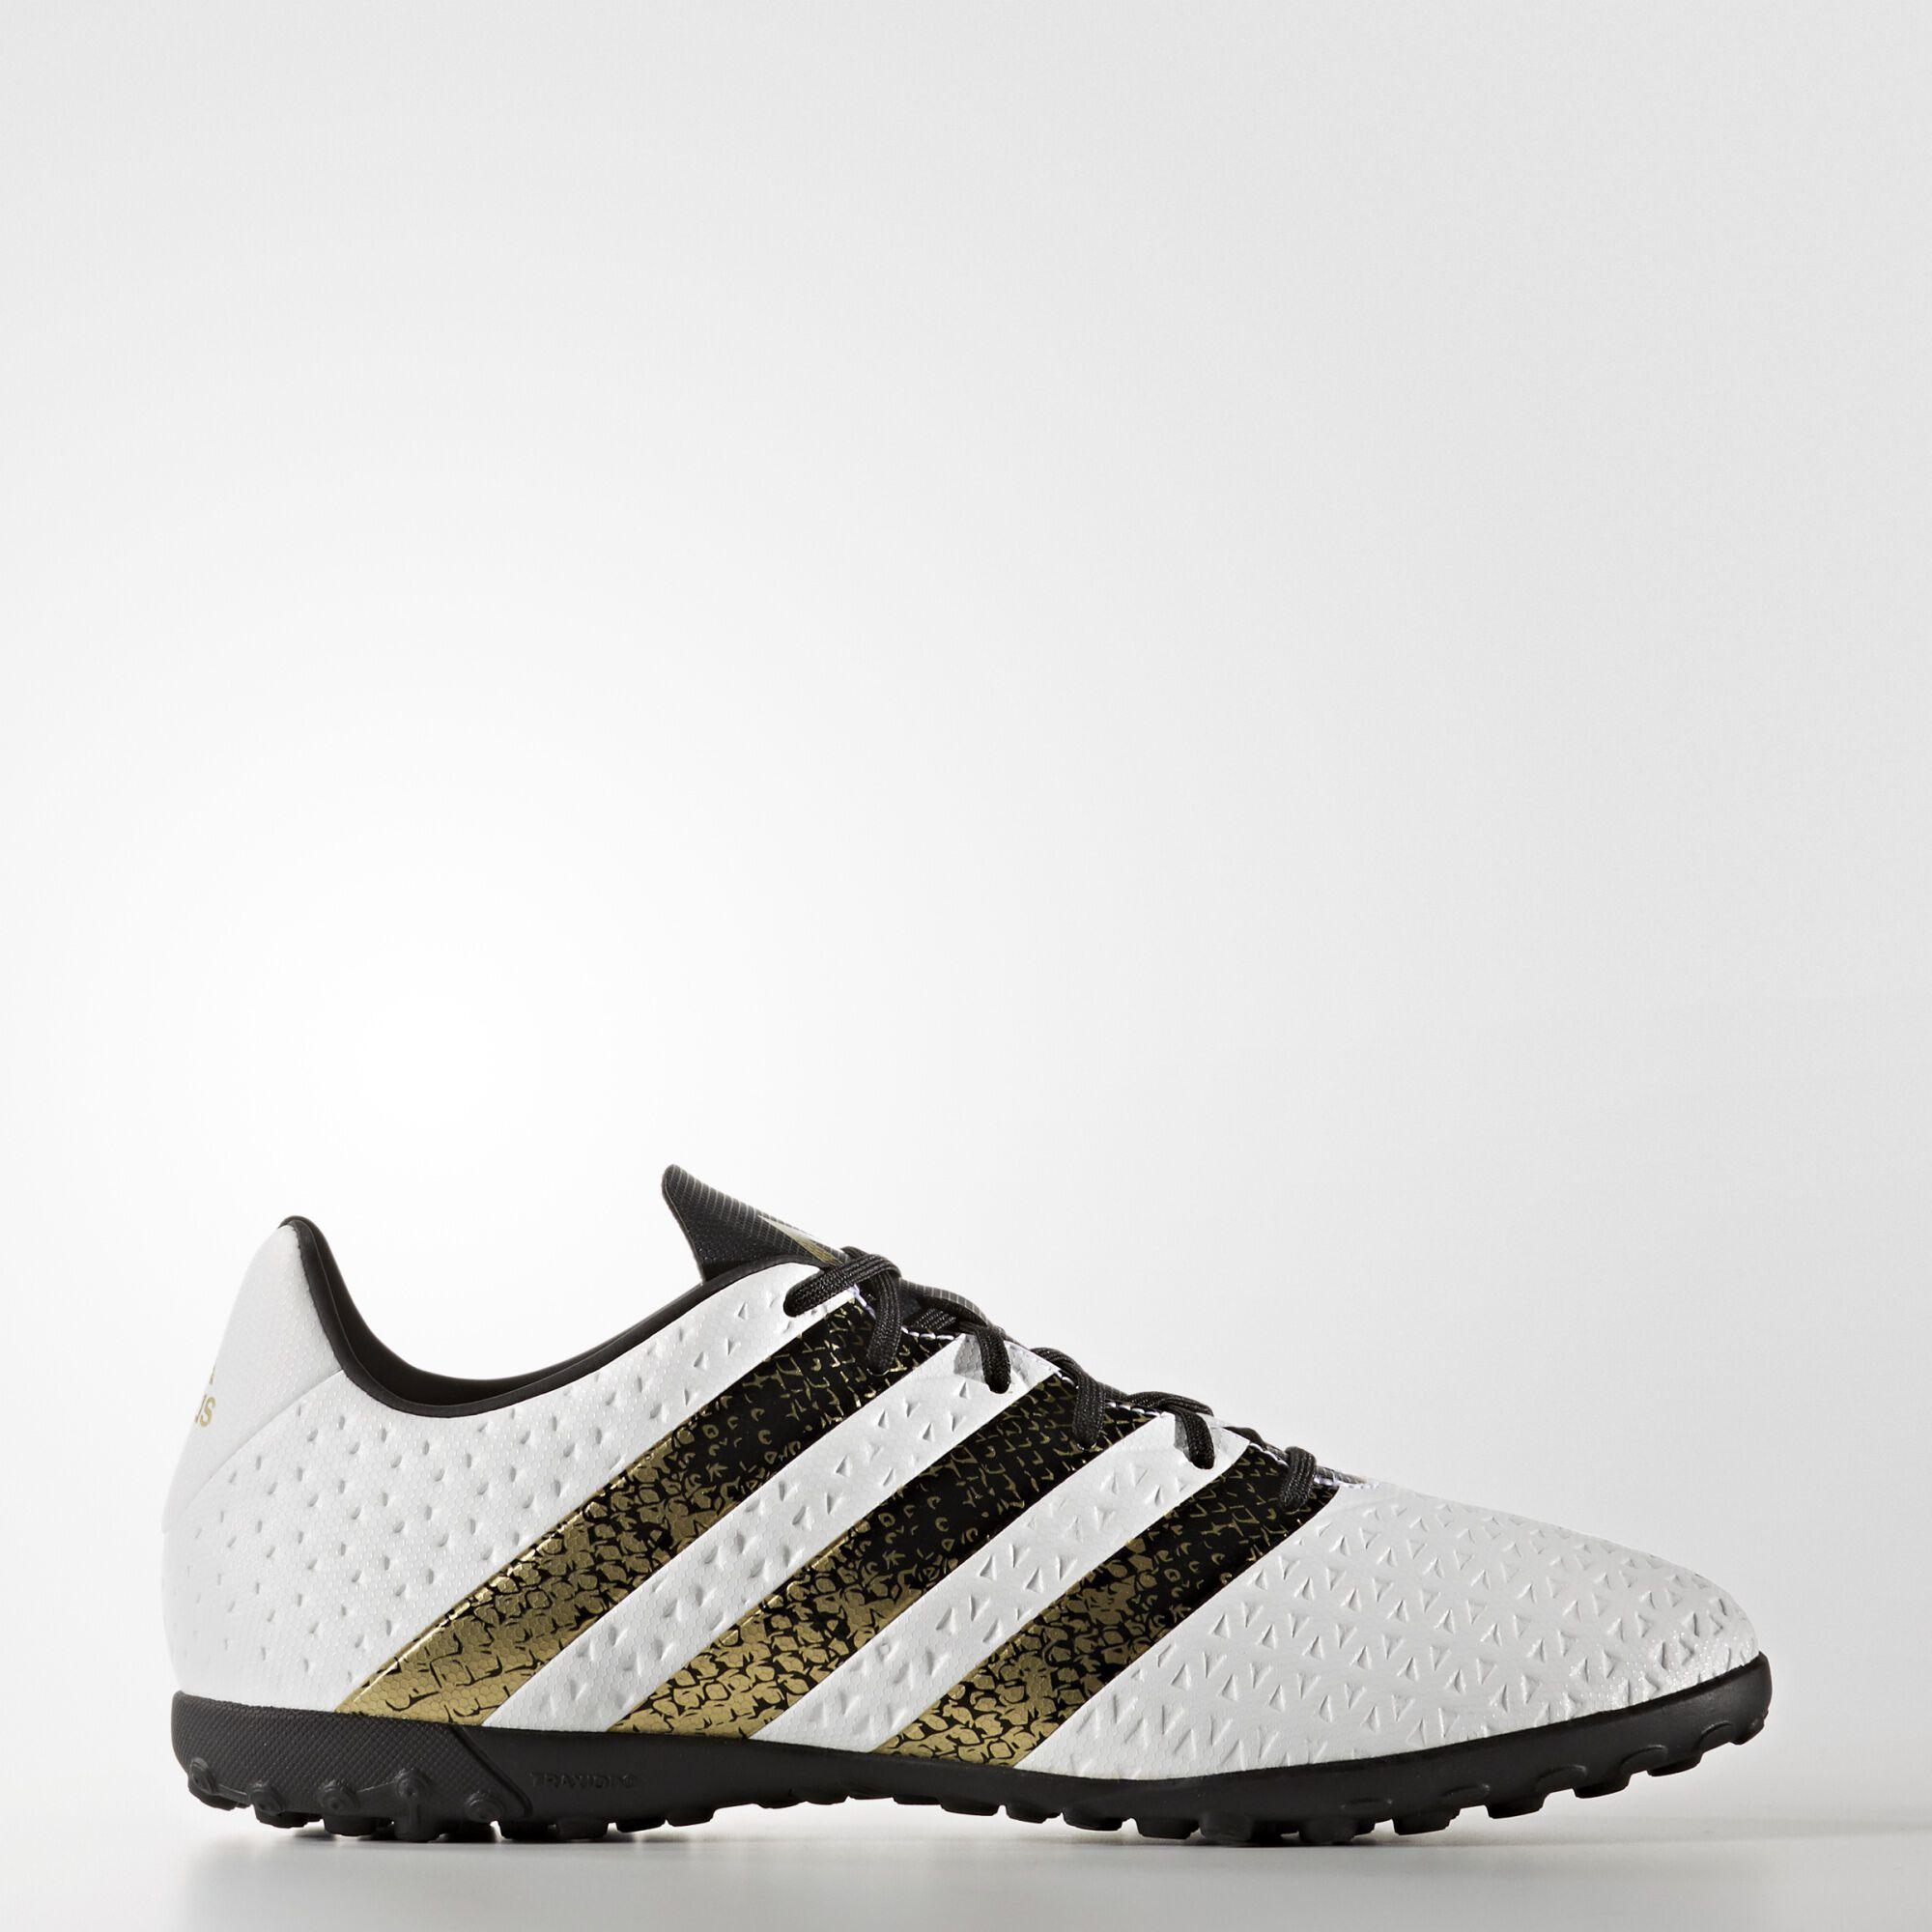 Zapatos Futbol Adidas Blancos